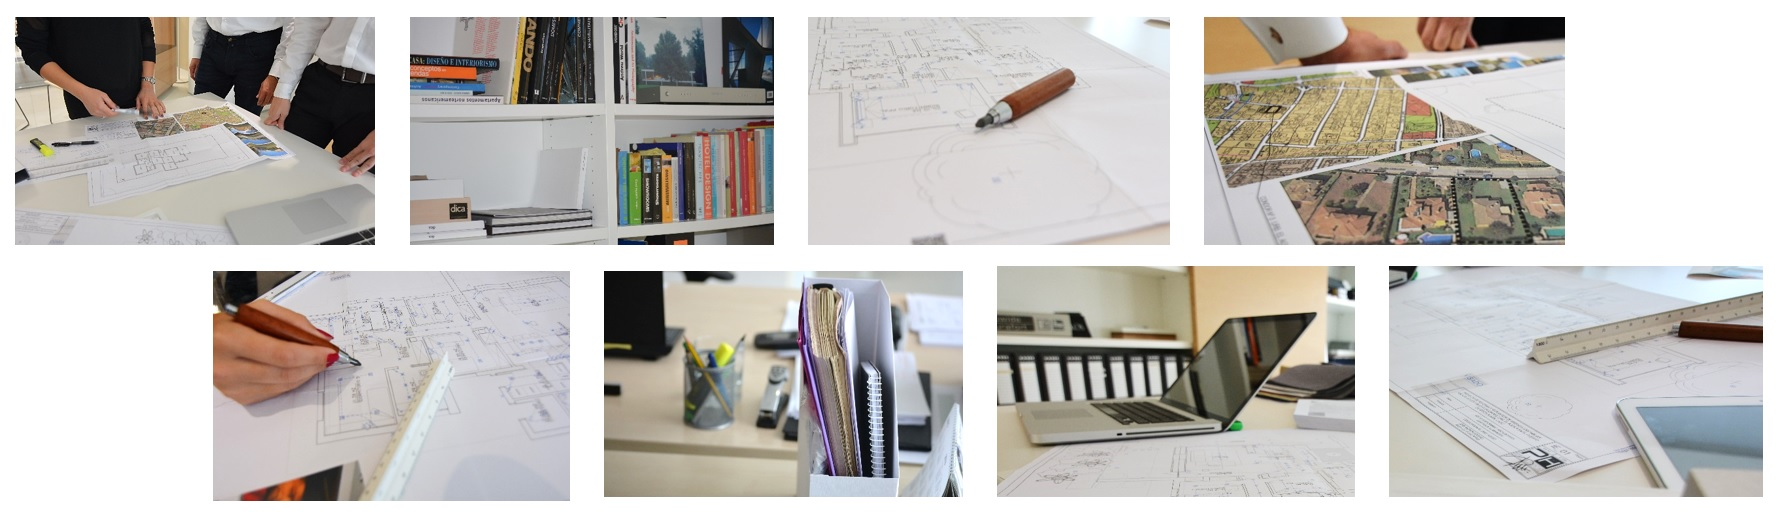 Studio Piezas Habitat- Integrated projects of architecture